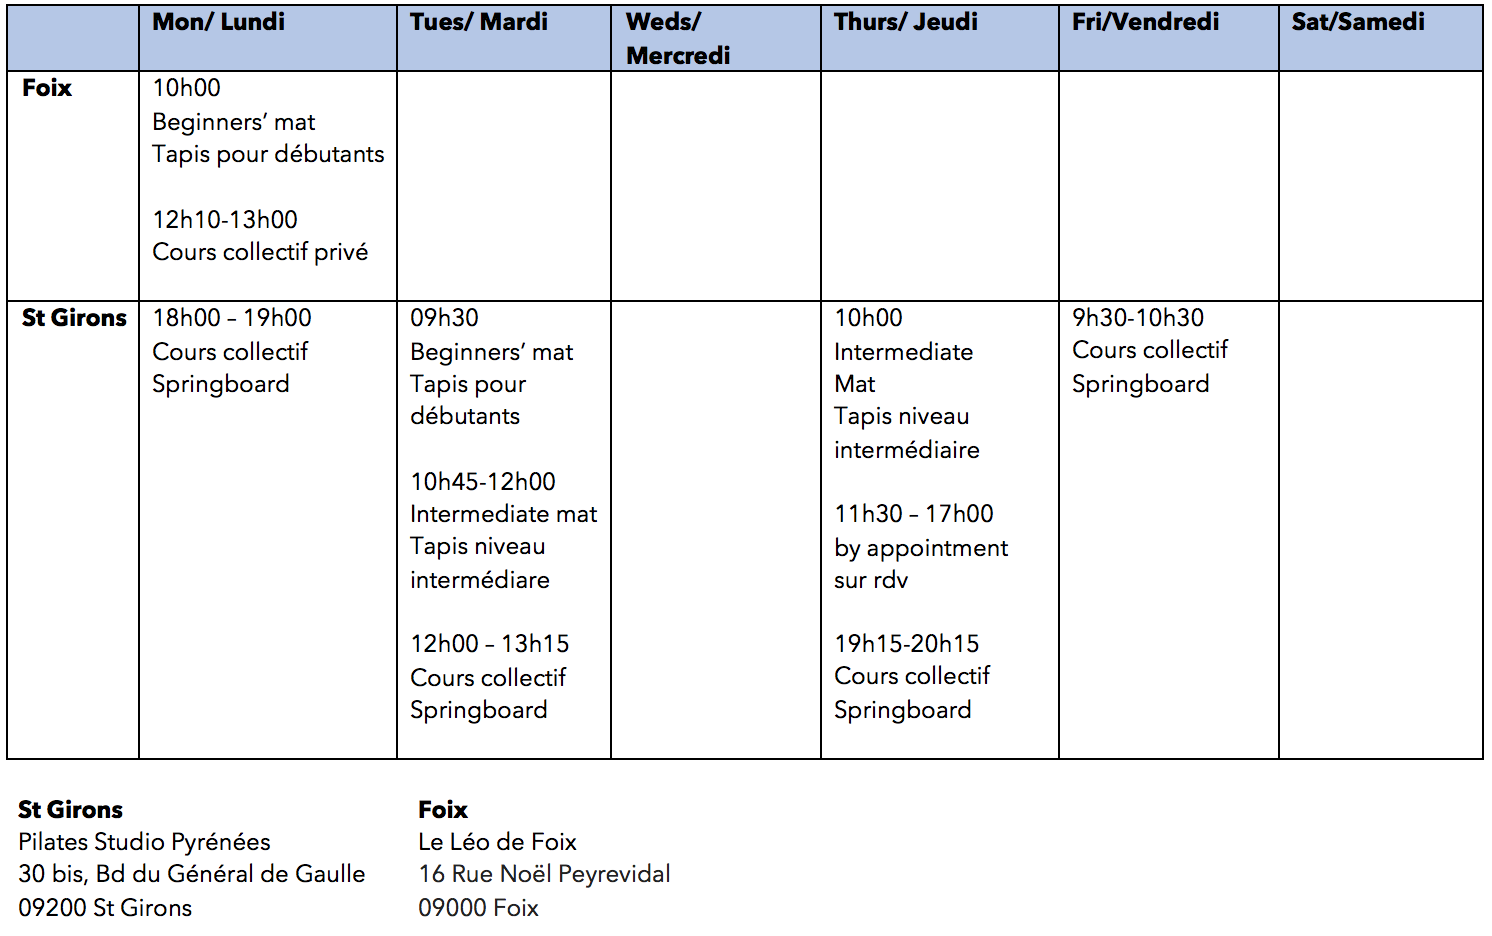 timetable sept 2018